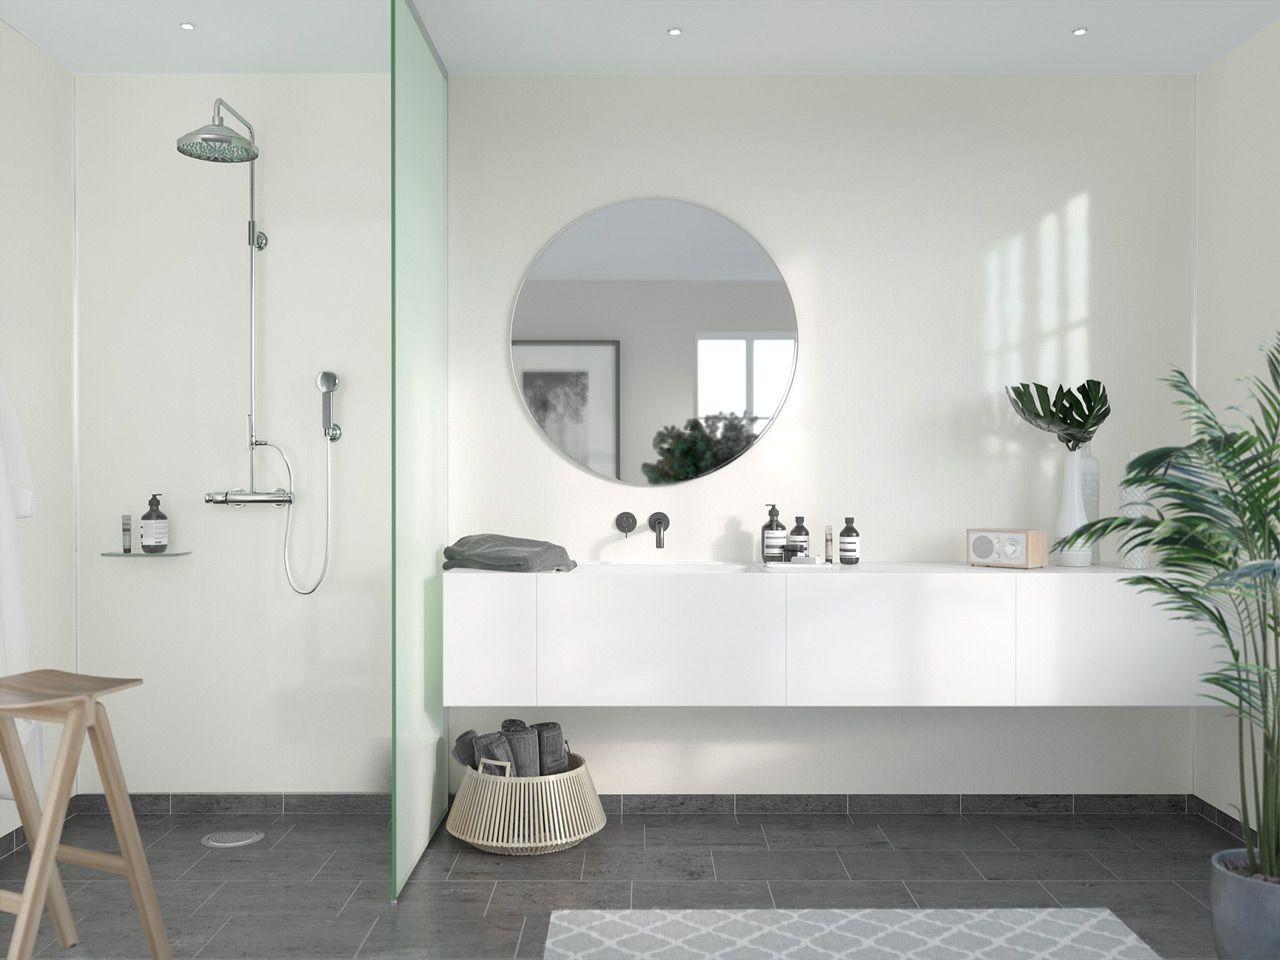 Laminated Diy Bathroom Shower Tub Wall Panels Kits Innovate Building Solutions Shabby Chic Bathroom Shower Tub Bathroom Wall Panels